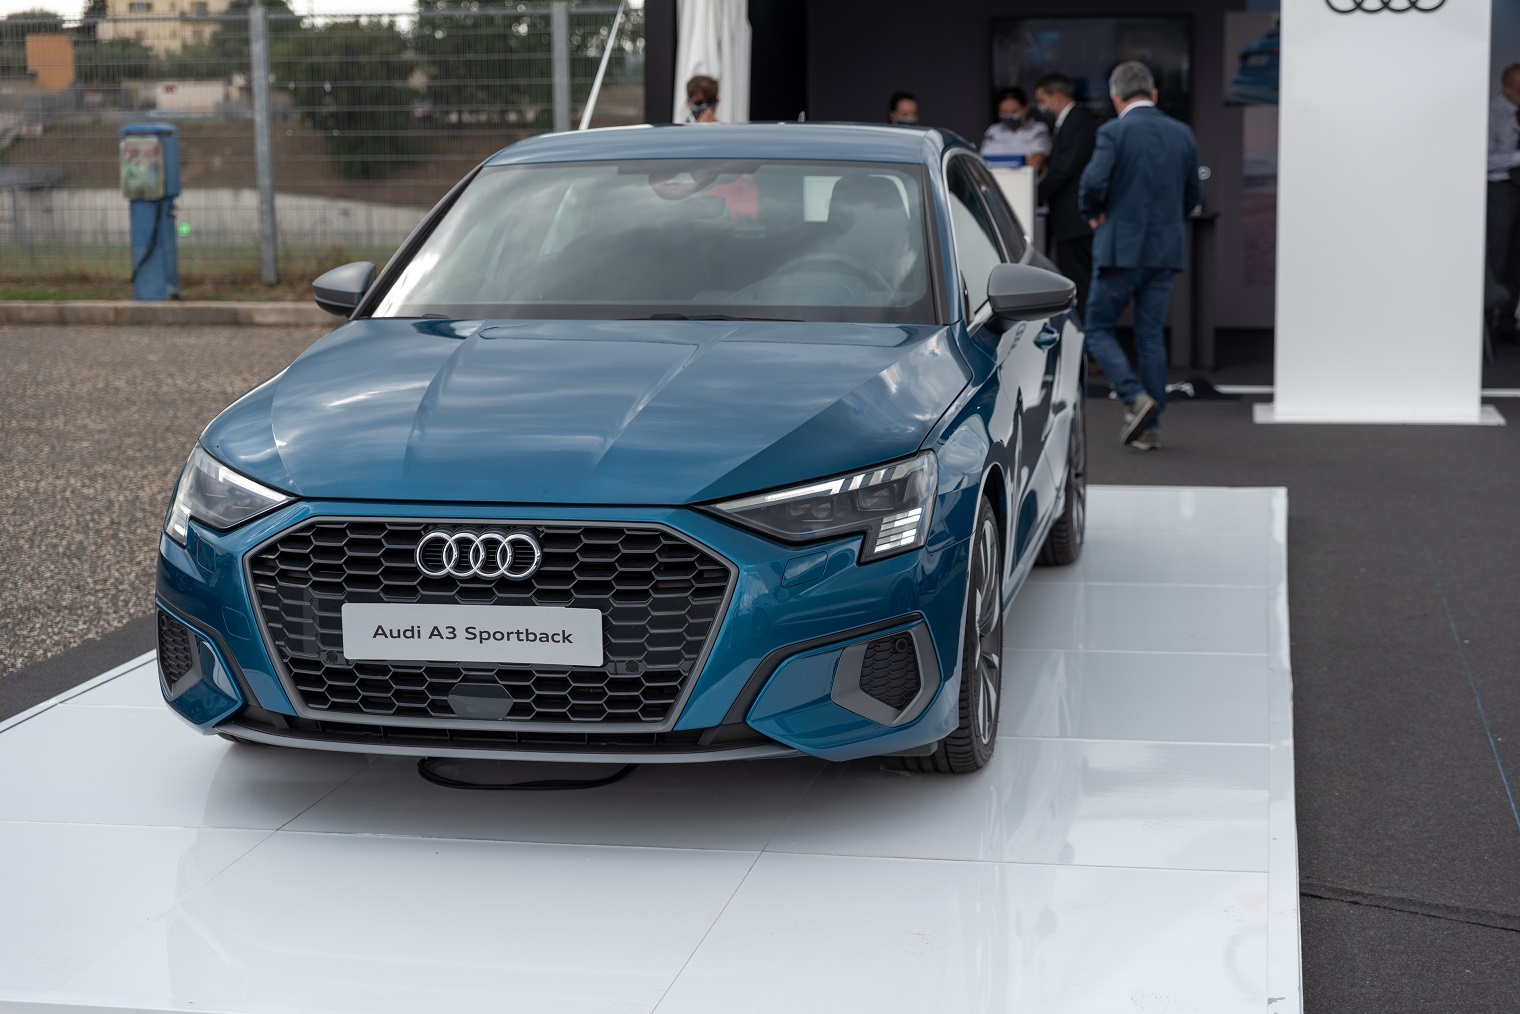 nuova Audi A3 Sportback Fleet Motor Day 2020